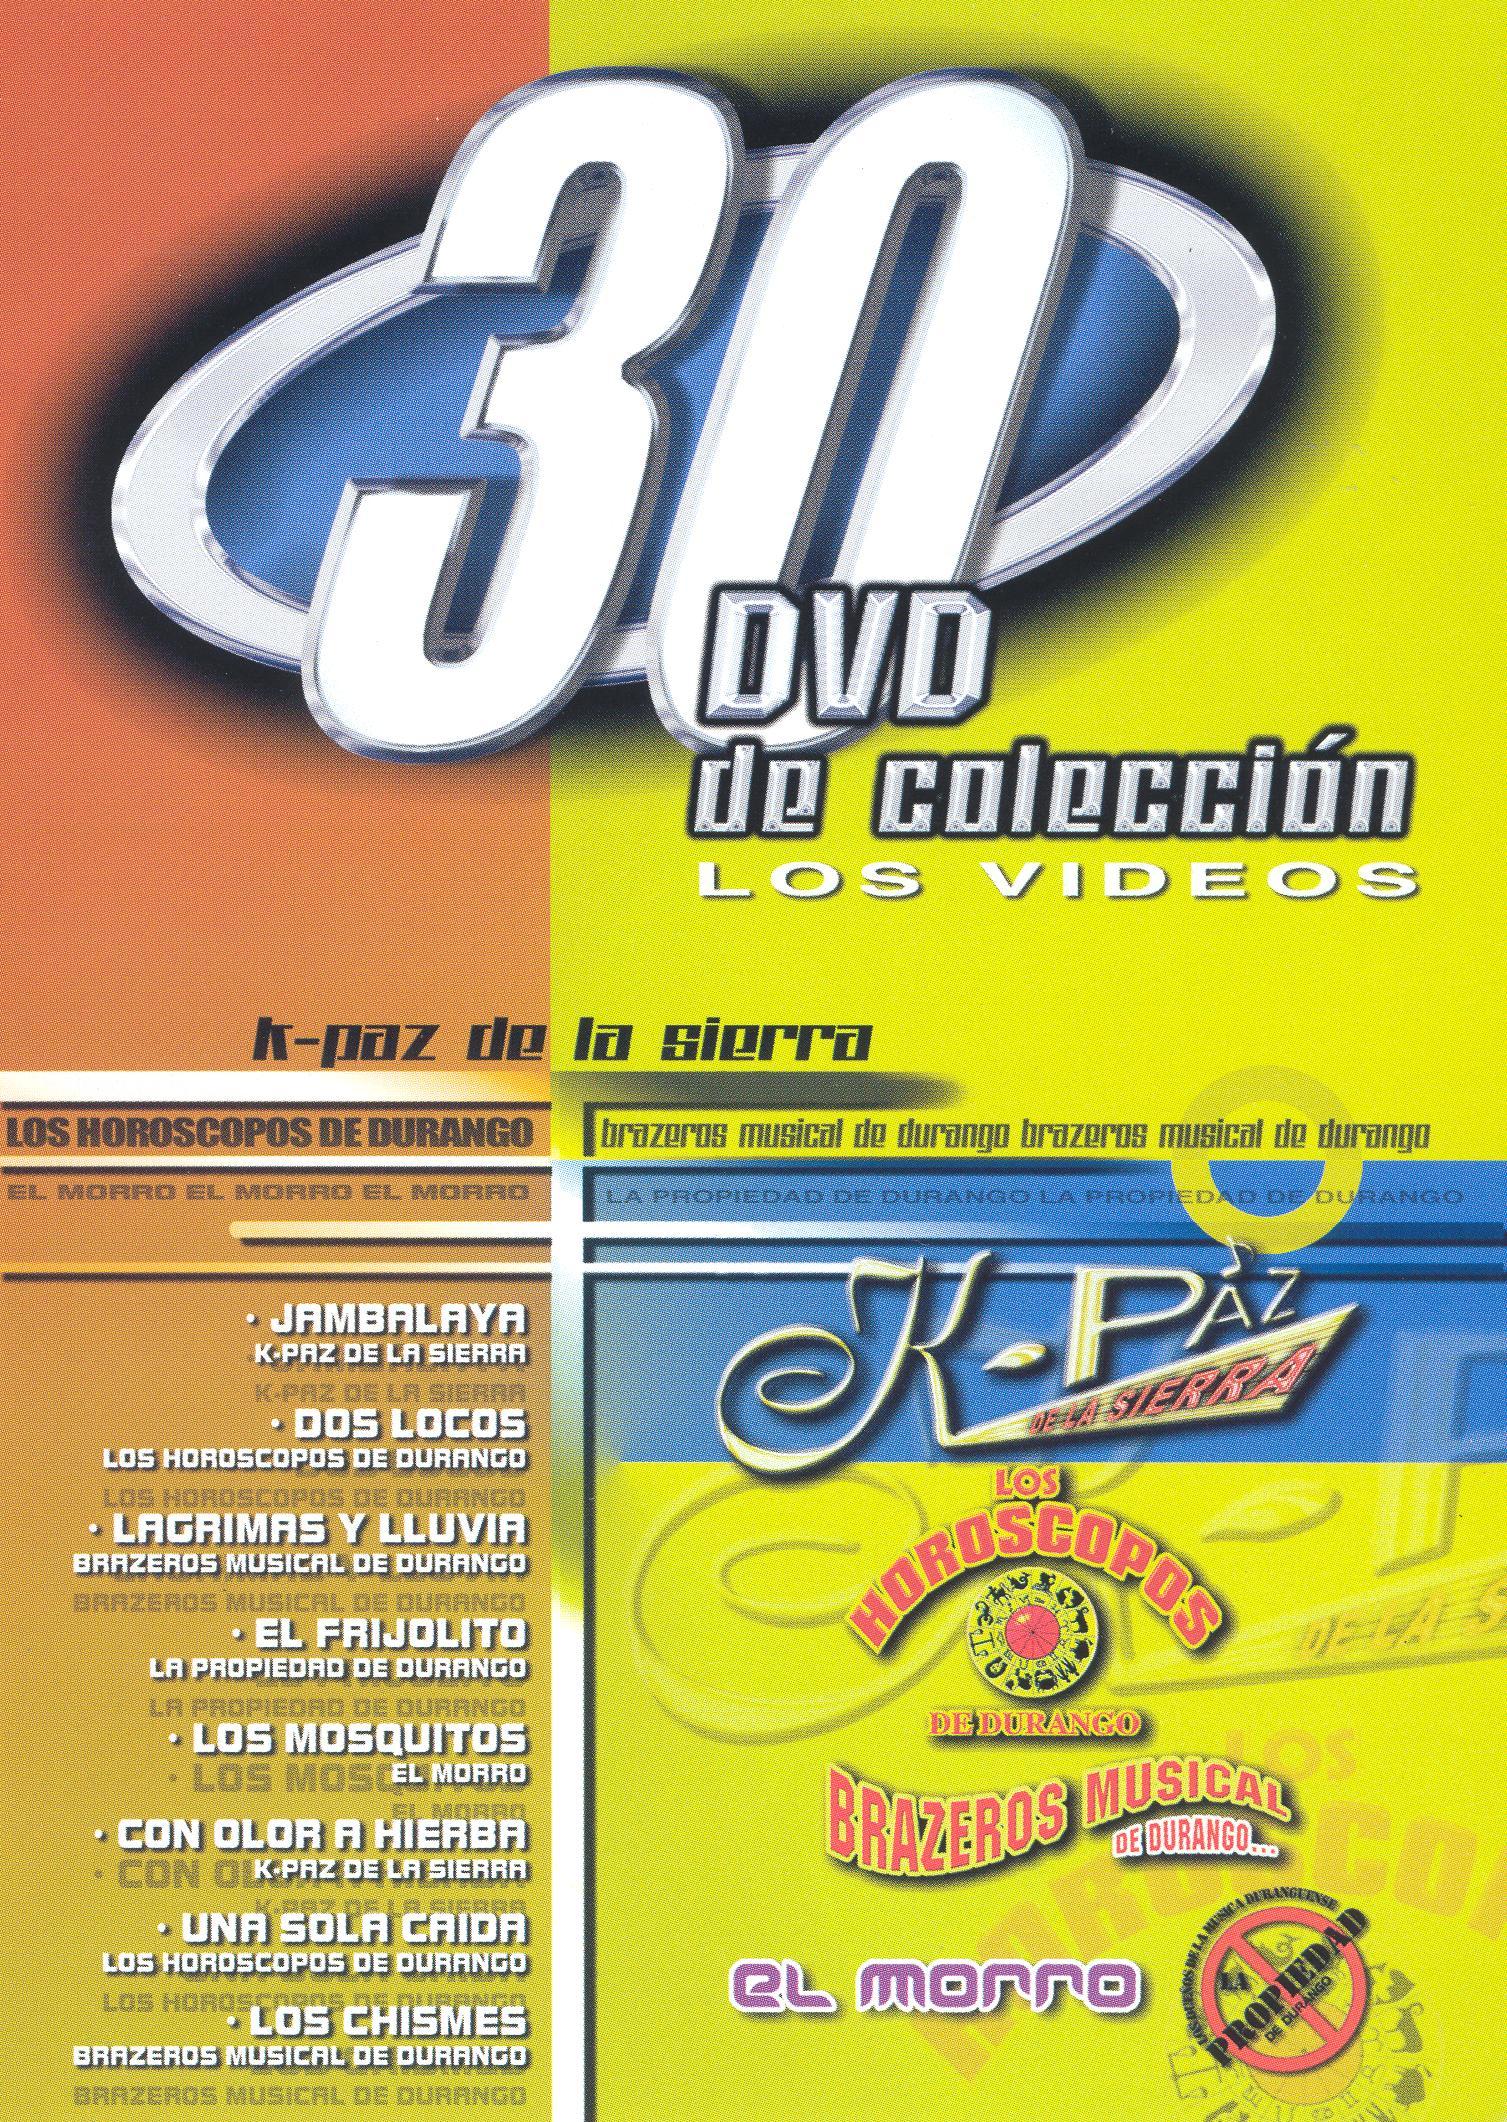 K-Paz de la Sierra/Los Horoscopos de Durango/Brazeros Musical de Durango: 30 DVD de colección